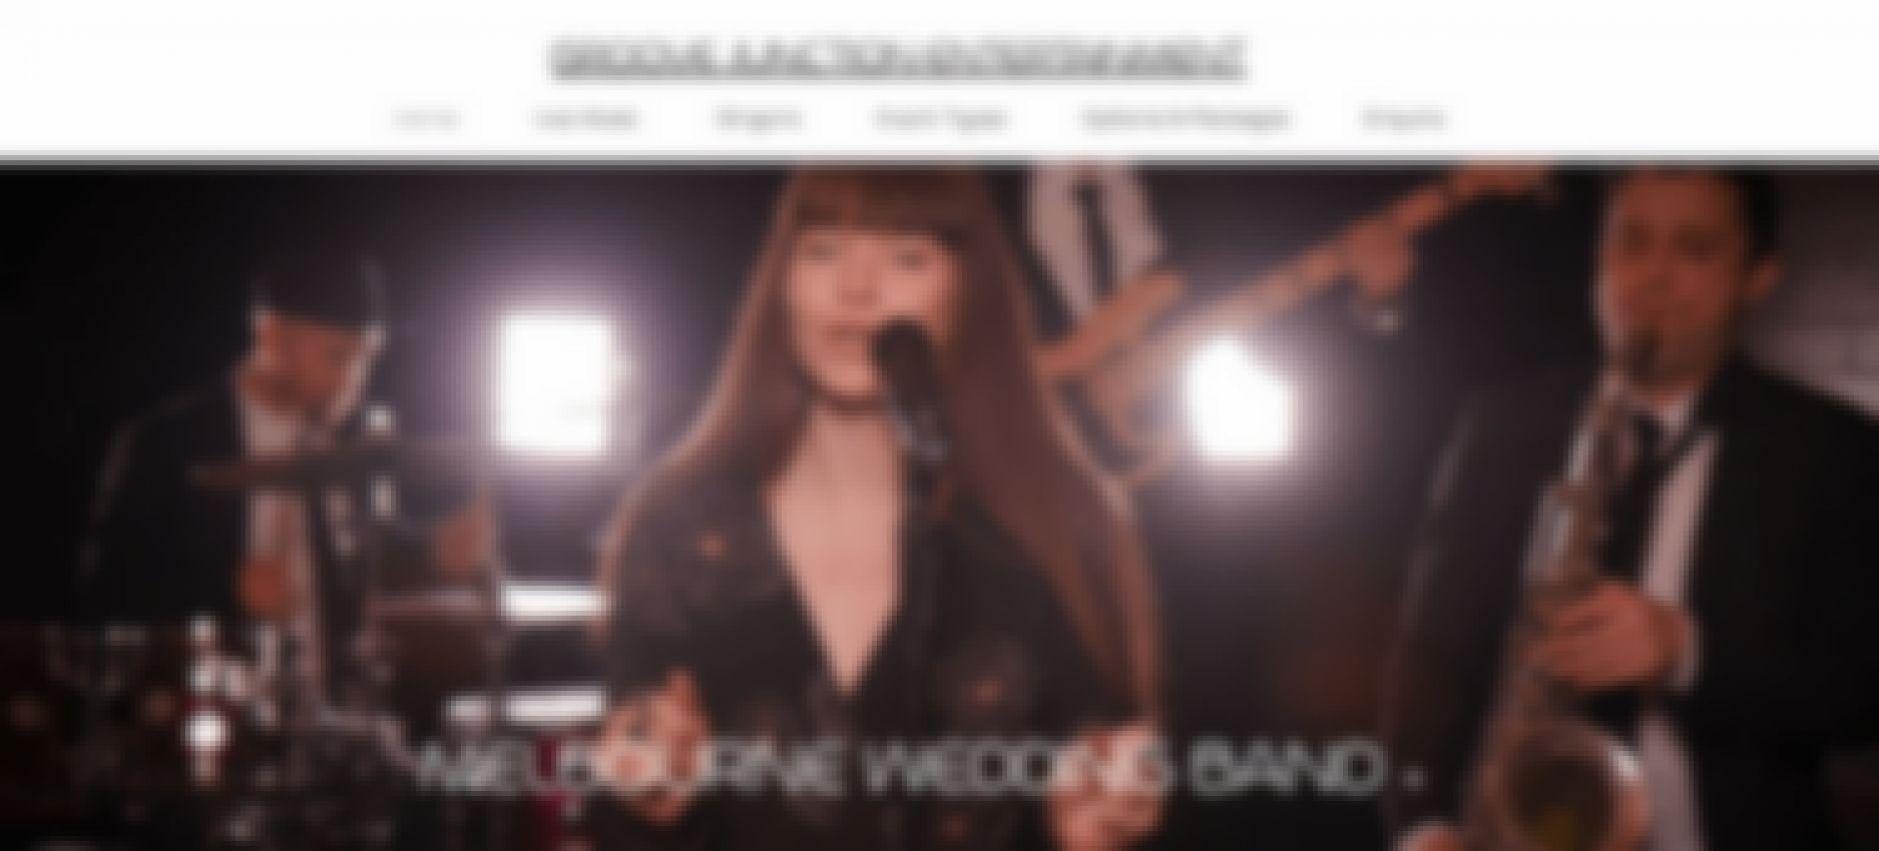 groove junction entertainment